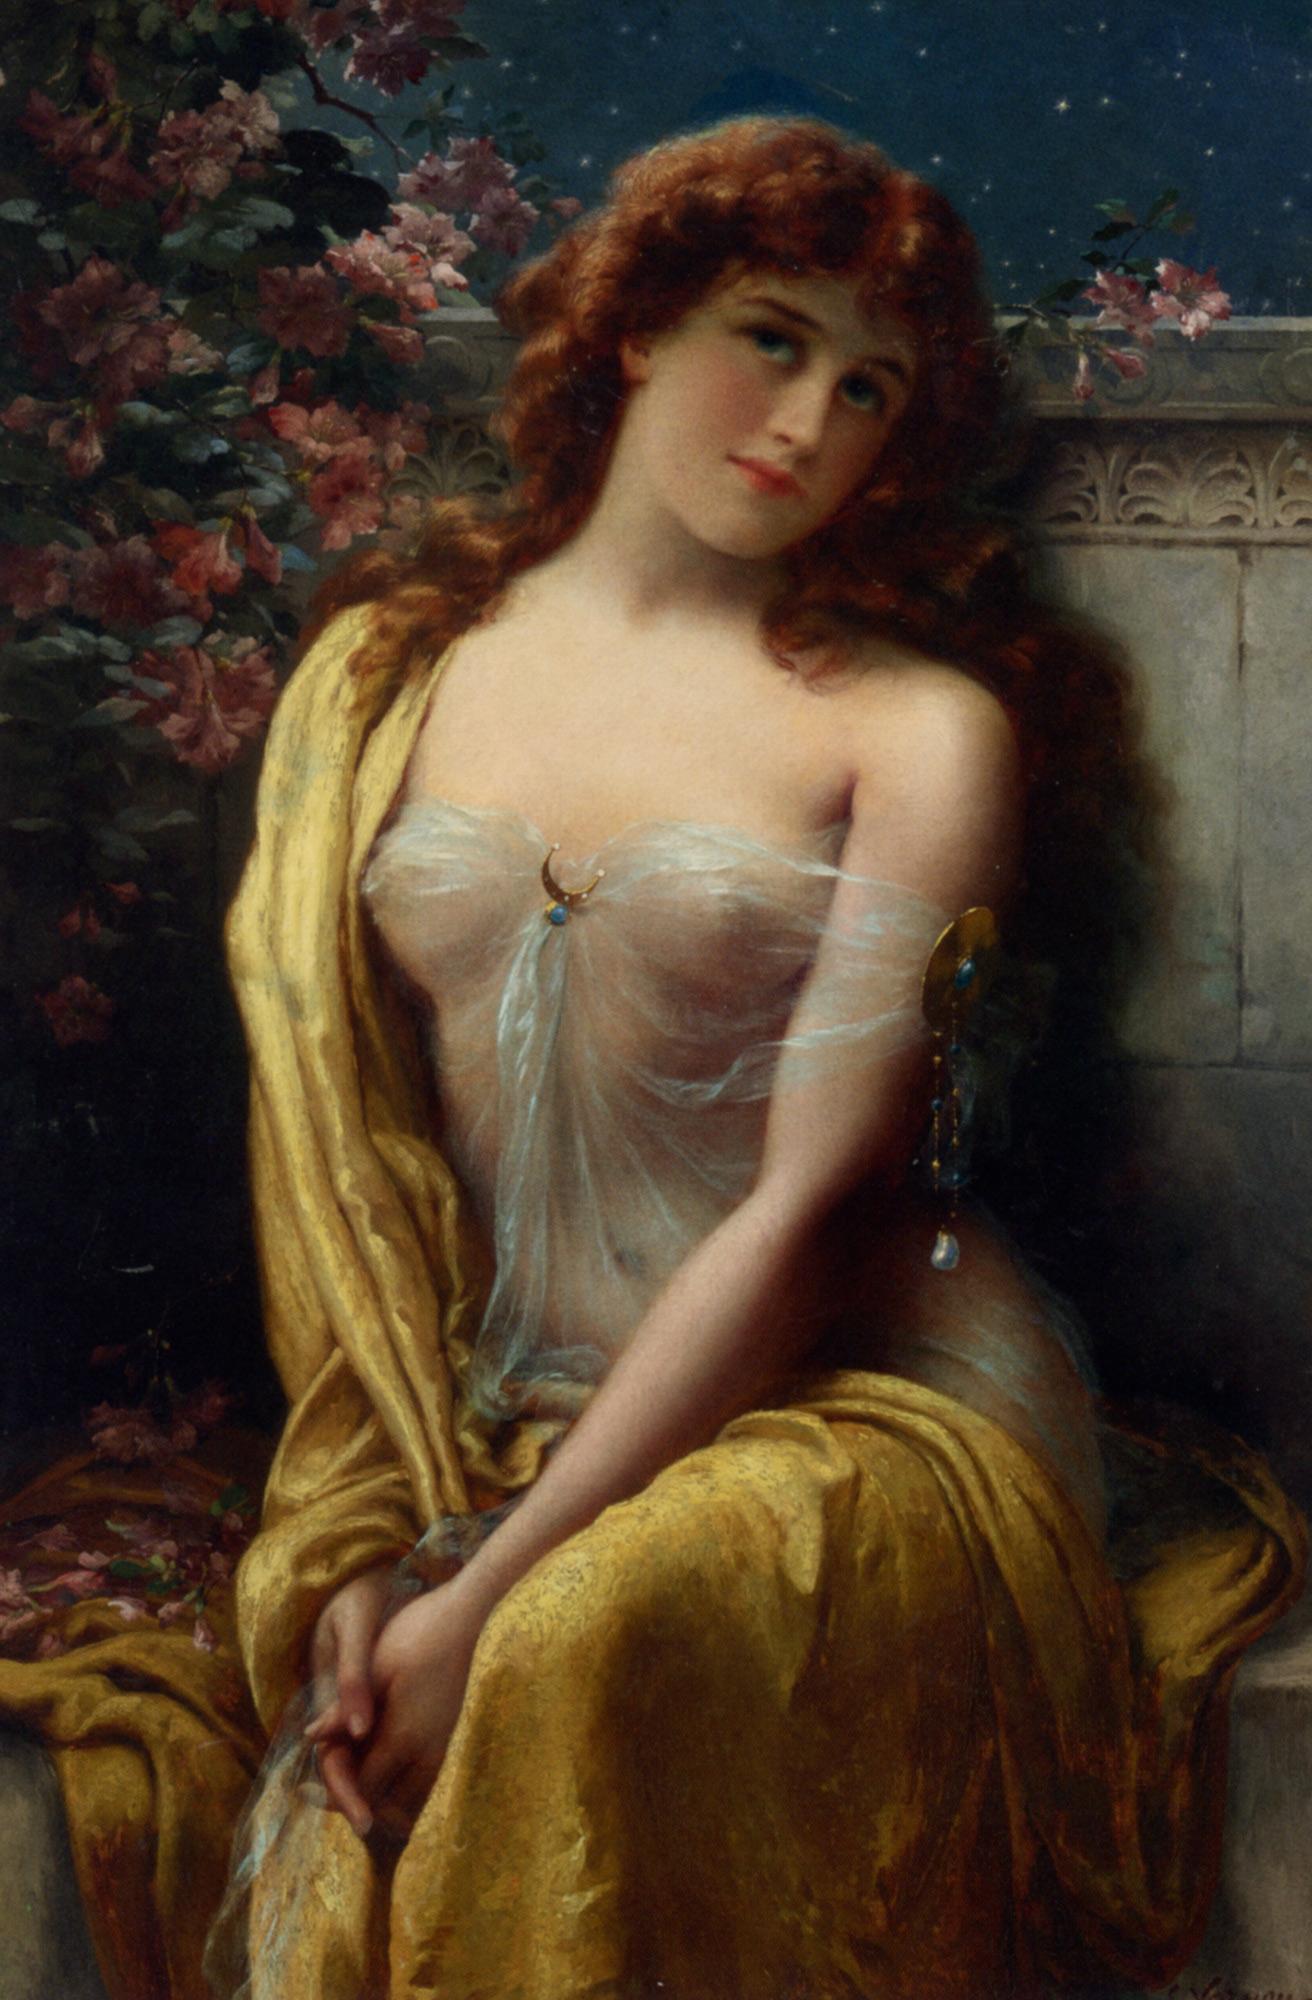 Starlight :: Emile Vernon - Nu in art and painting ôîòî